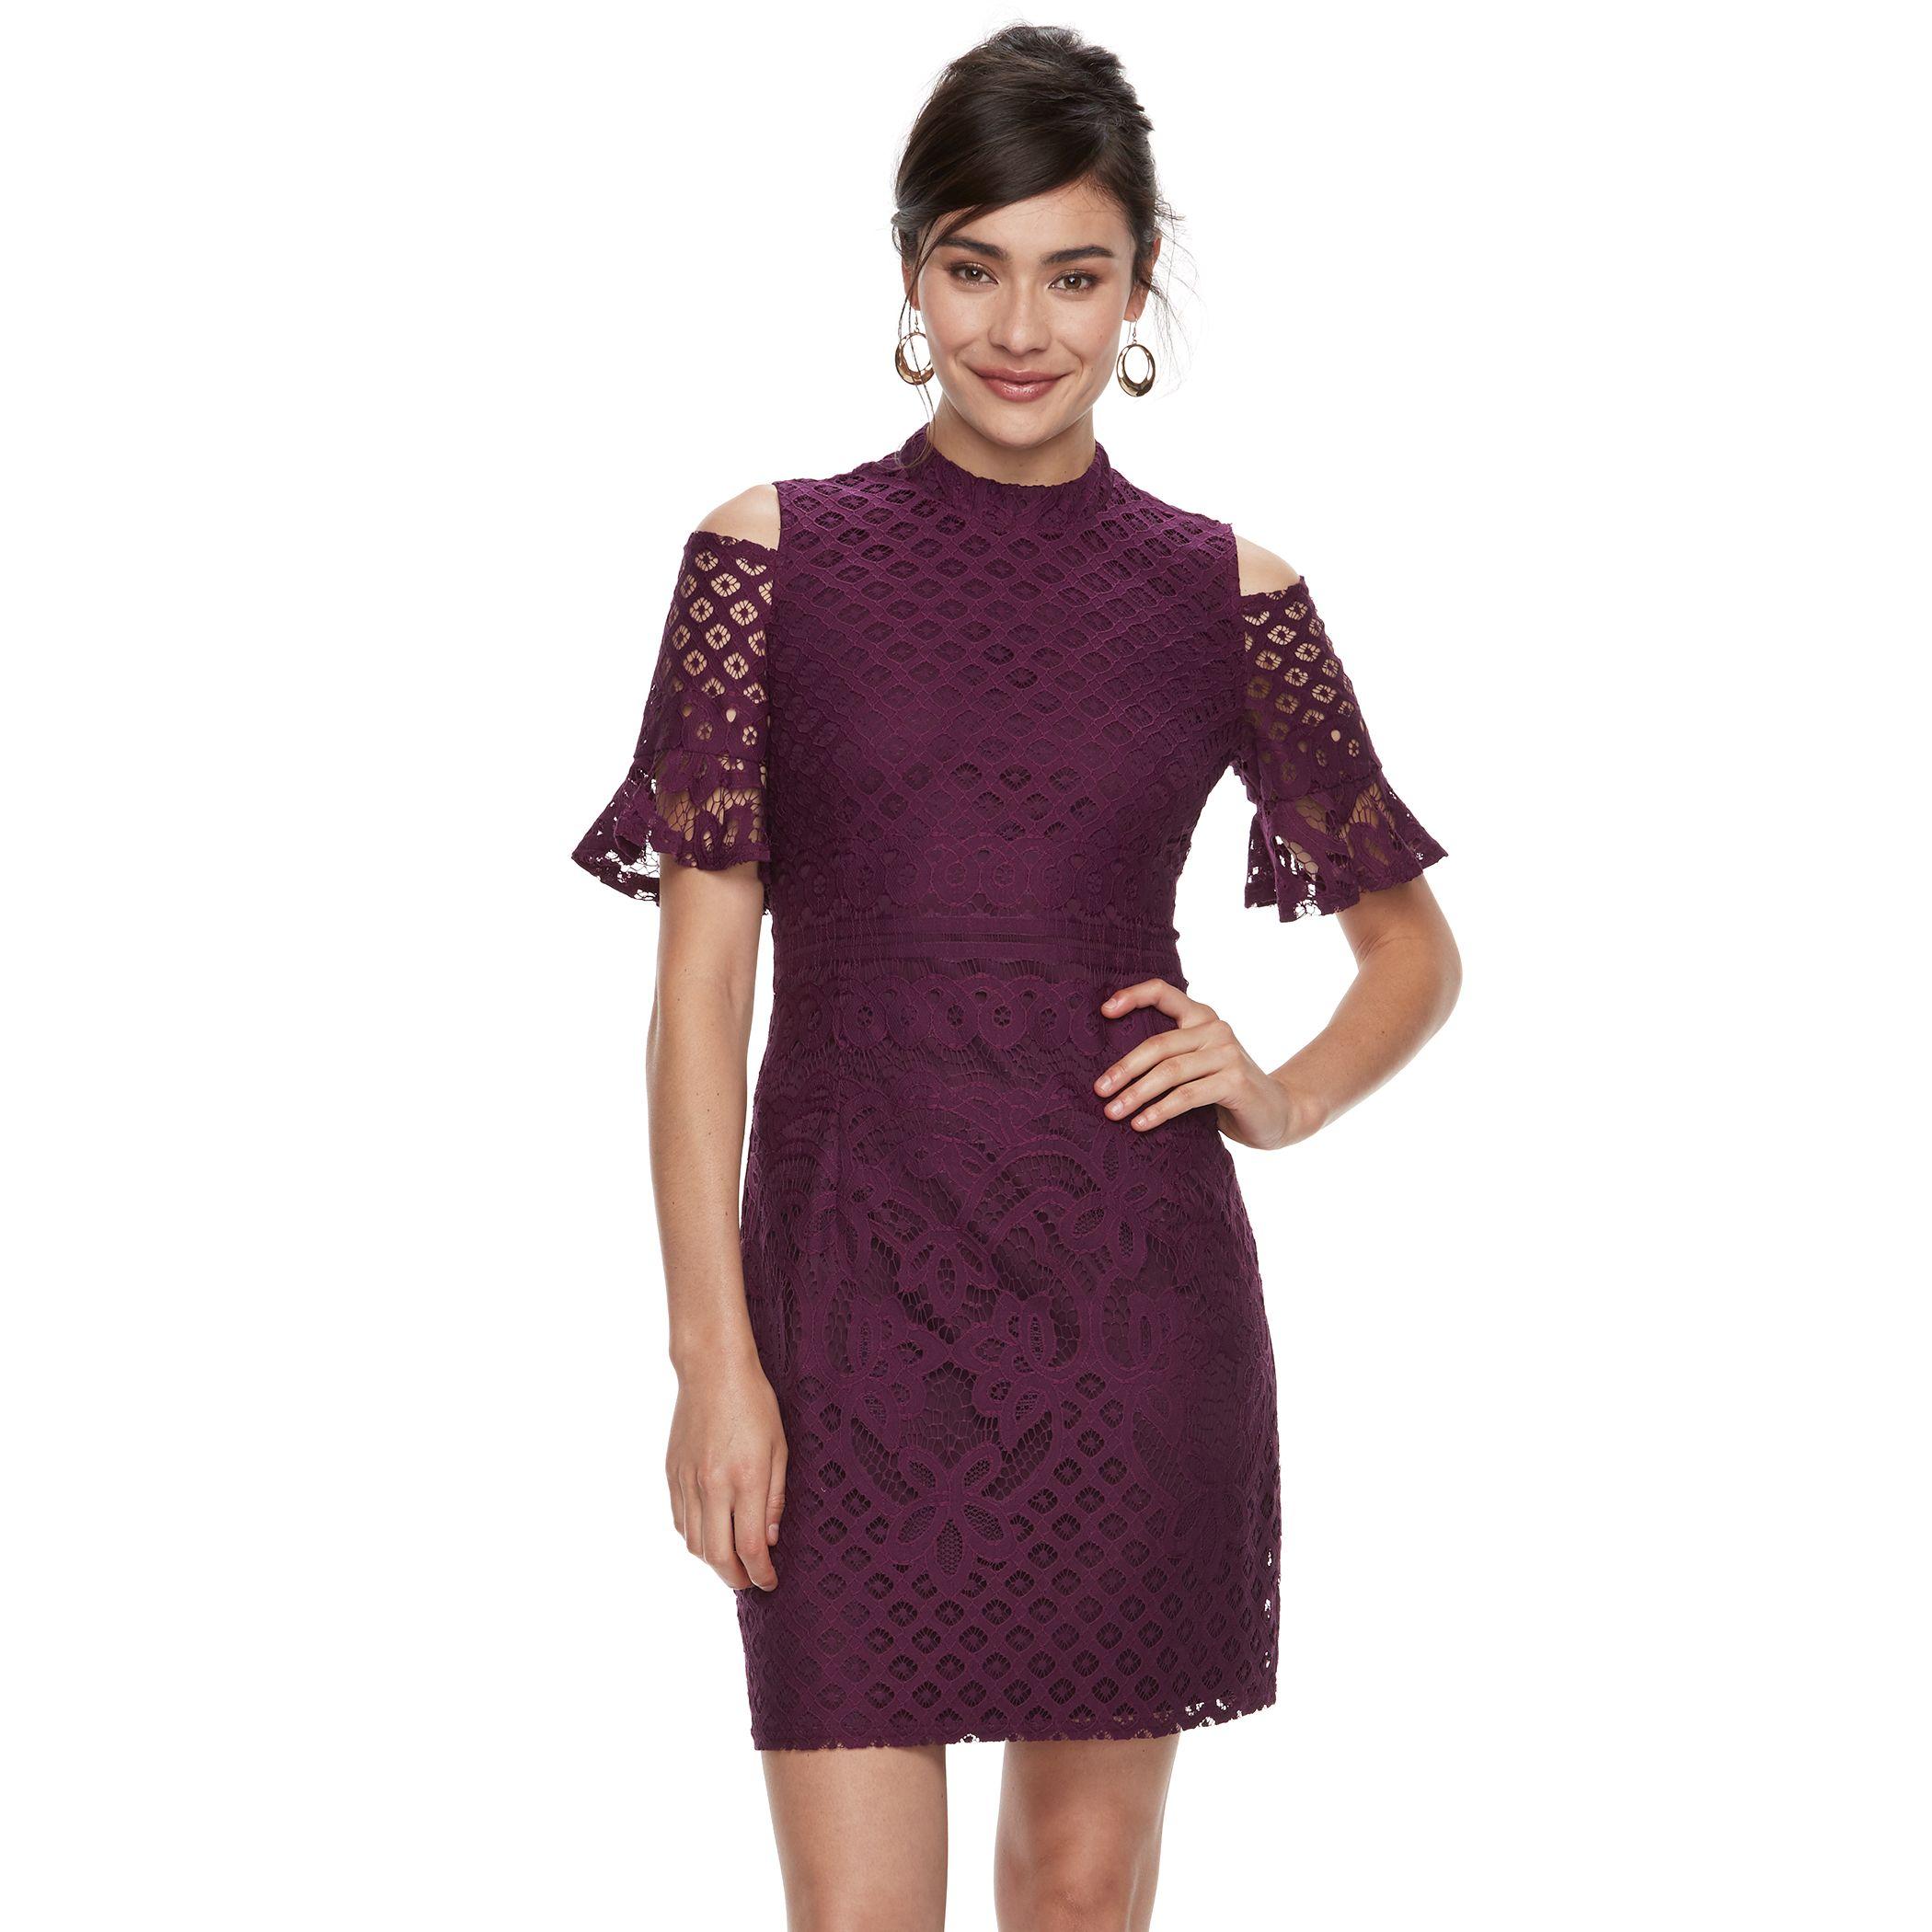 Womenu0027s Sharagano Crochet Lace Cold Shoulder Dress. Purple Navy Pink Good Looking